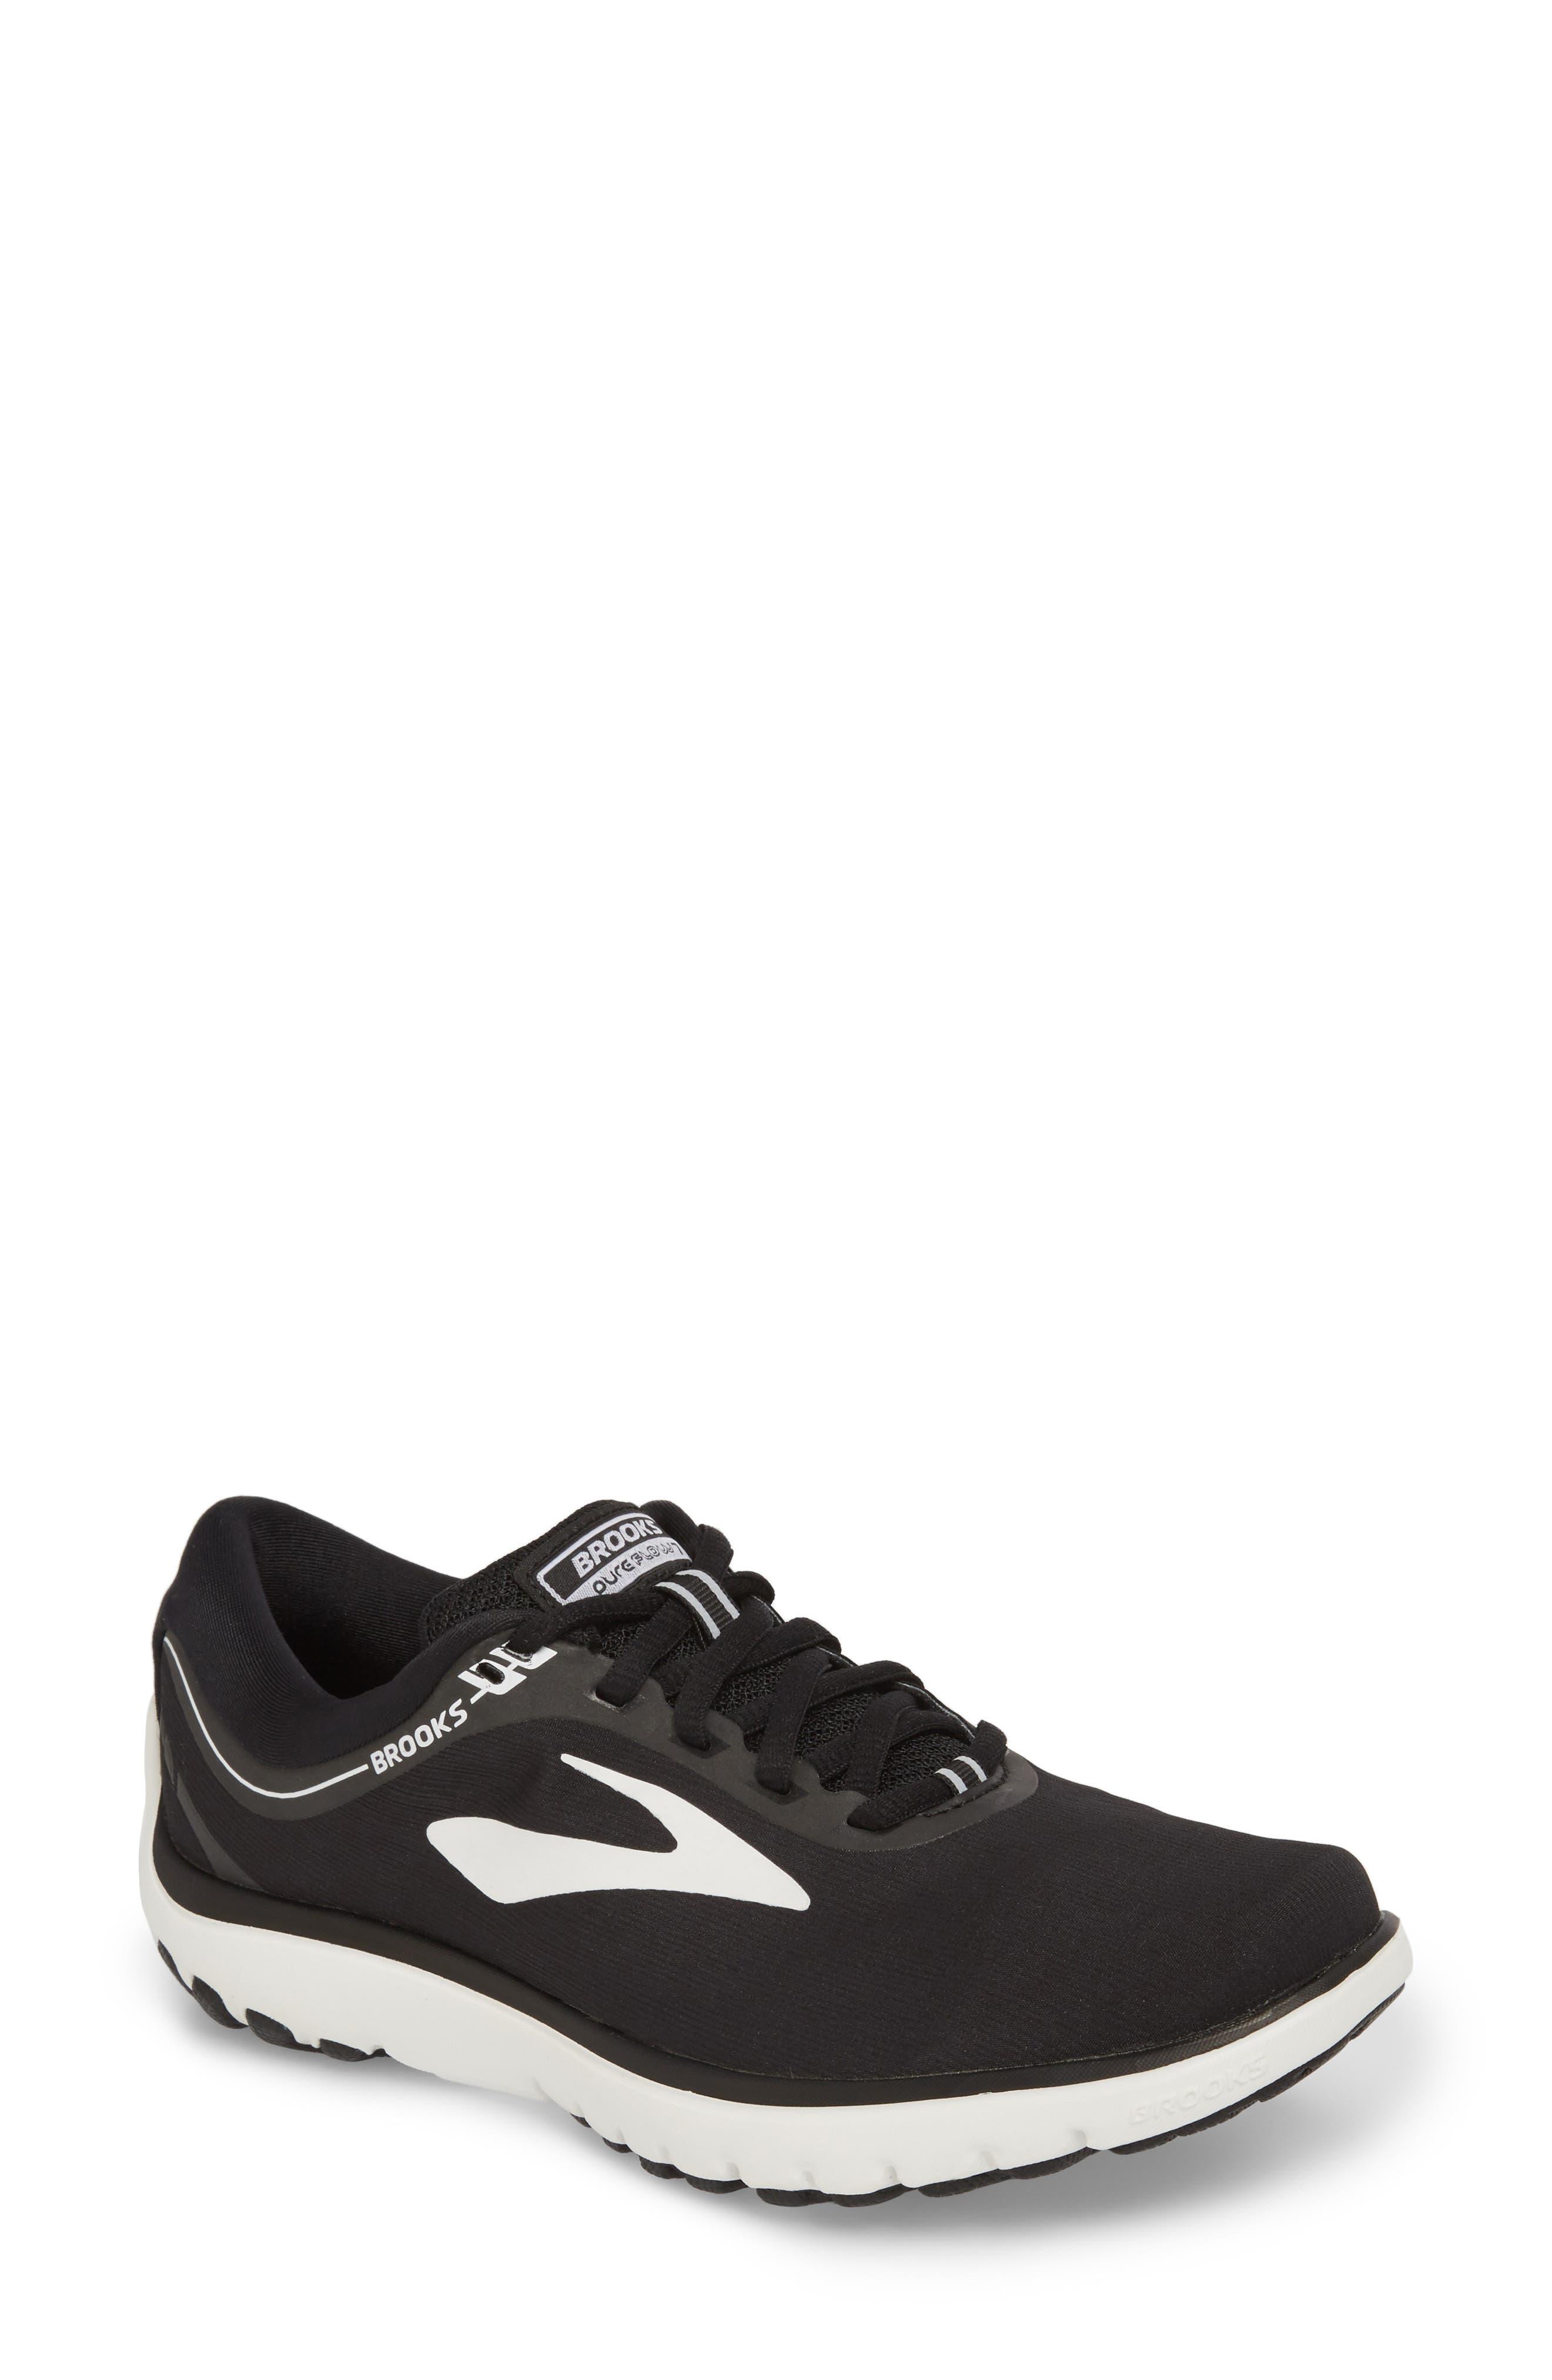 b7611b4f29b3b Women s Brooks Sneakers   Running Shoes